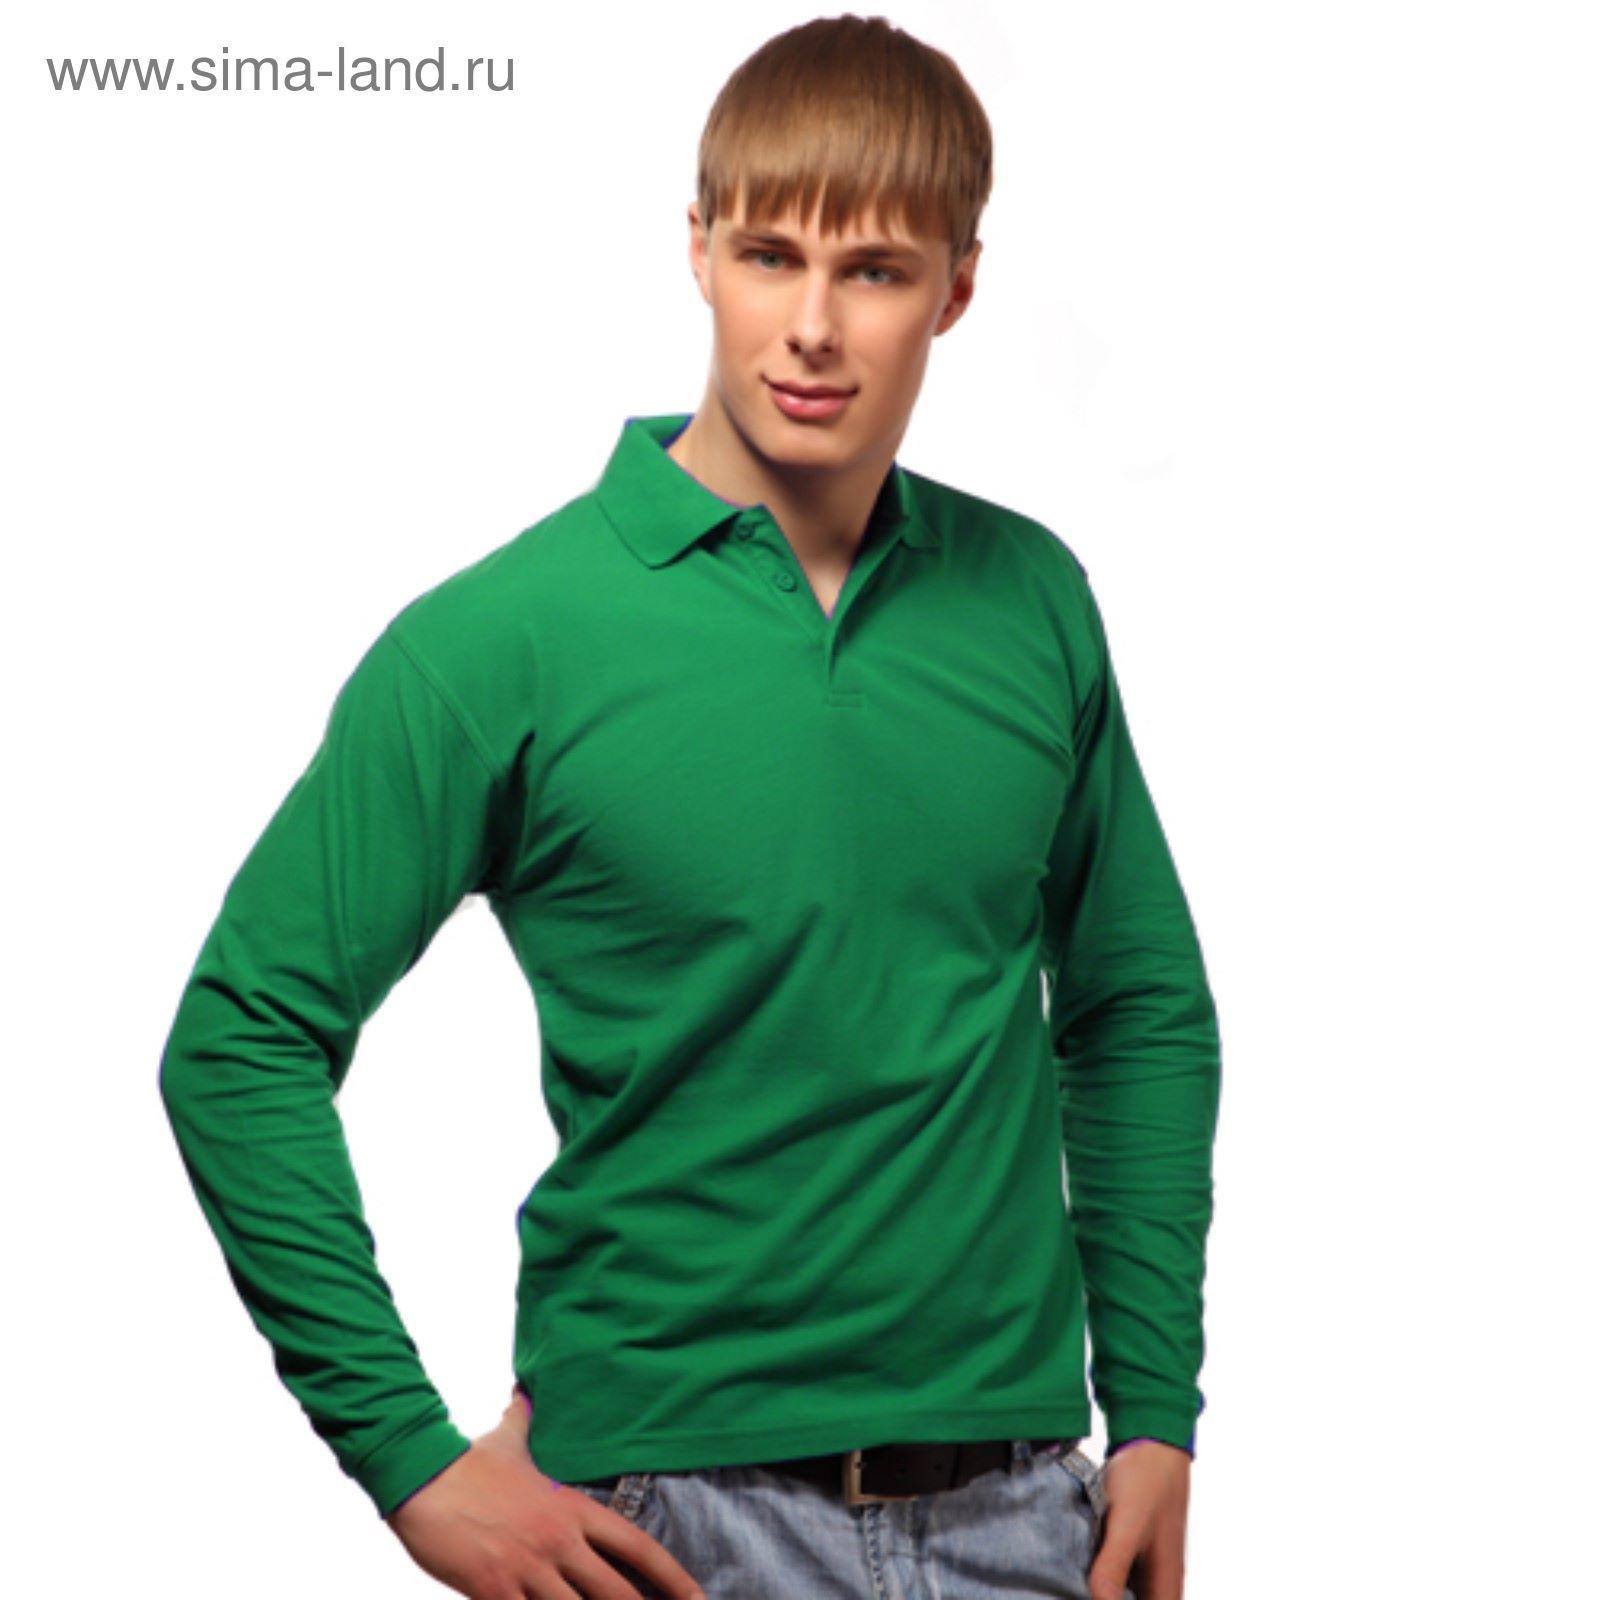 985bda74dcb Рубашка-поло мужская StanPolo